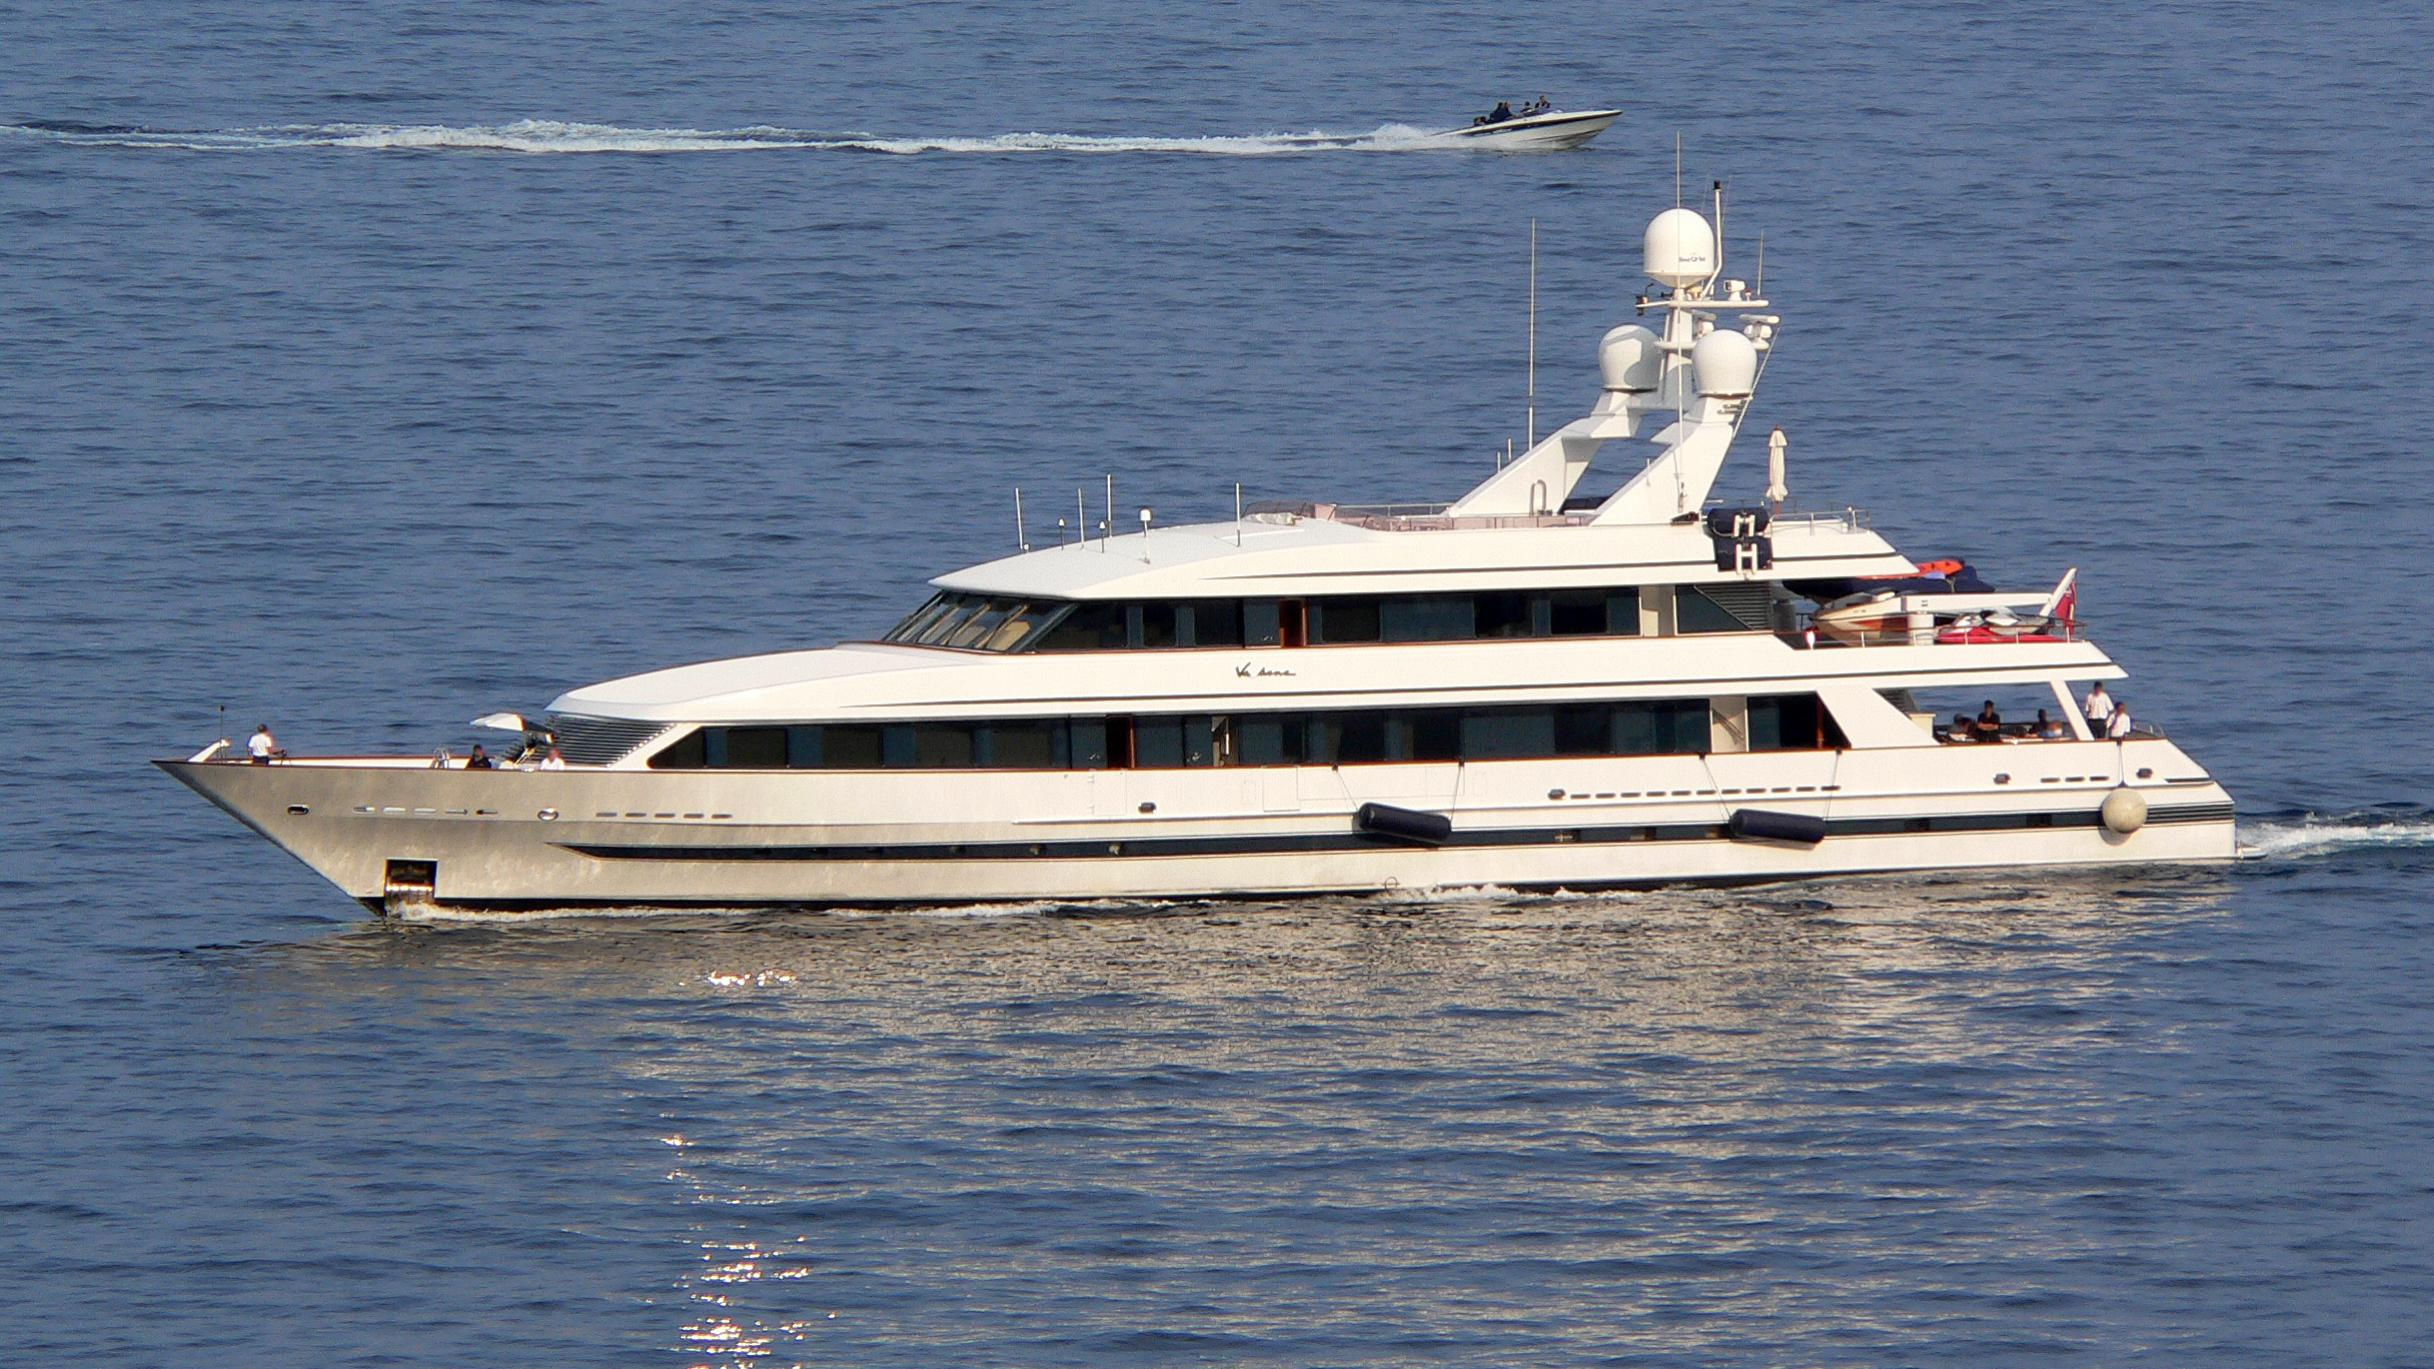 va-bene-motor-yacht-cornelissen-1992-46m-cruising